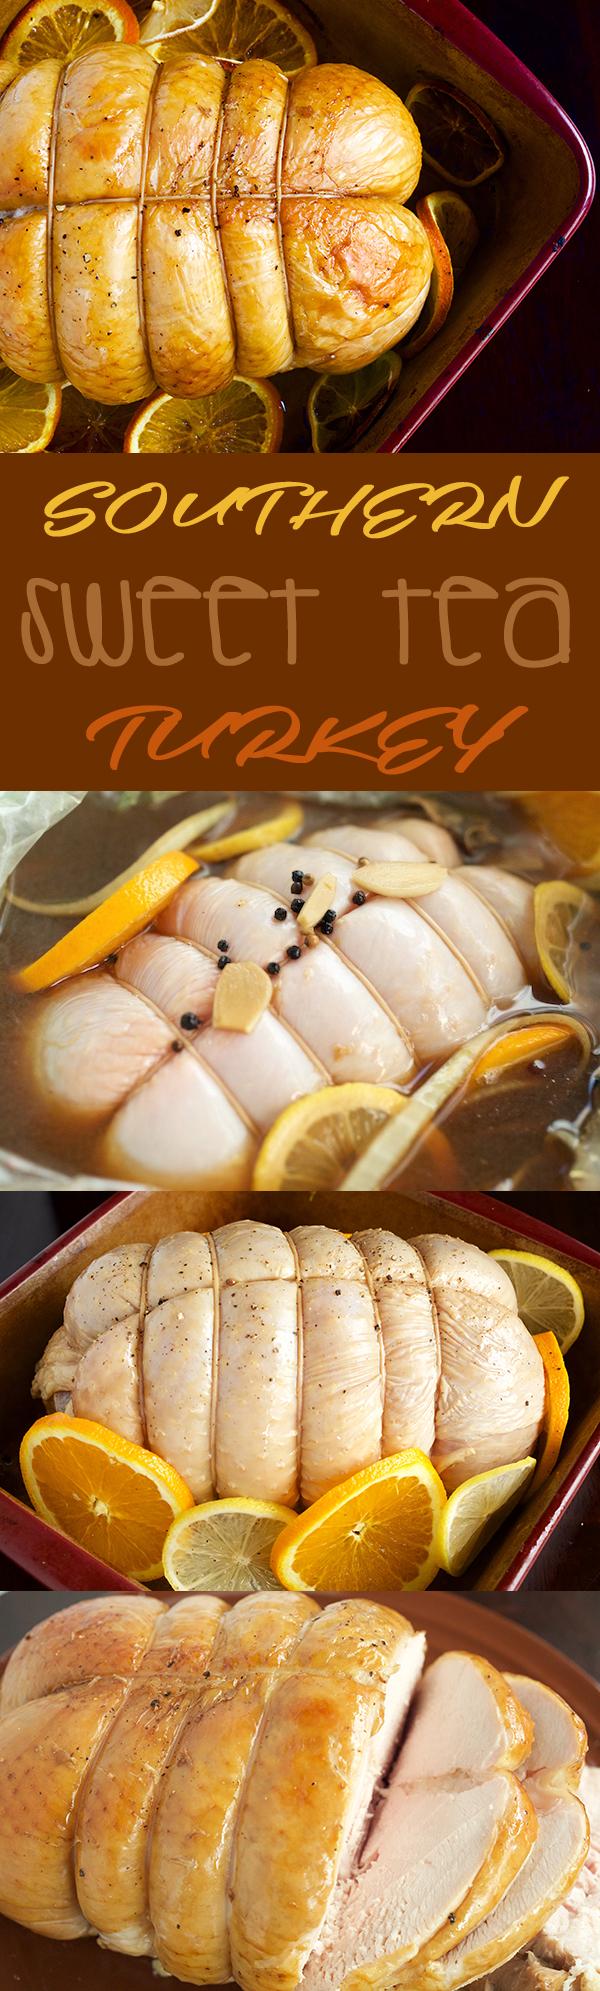 Southern Sweet Tea Turkey Brine